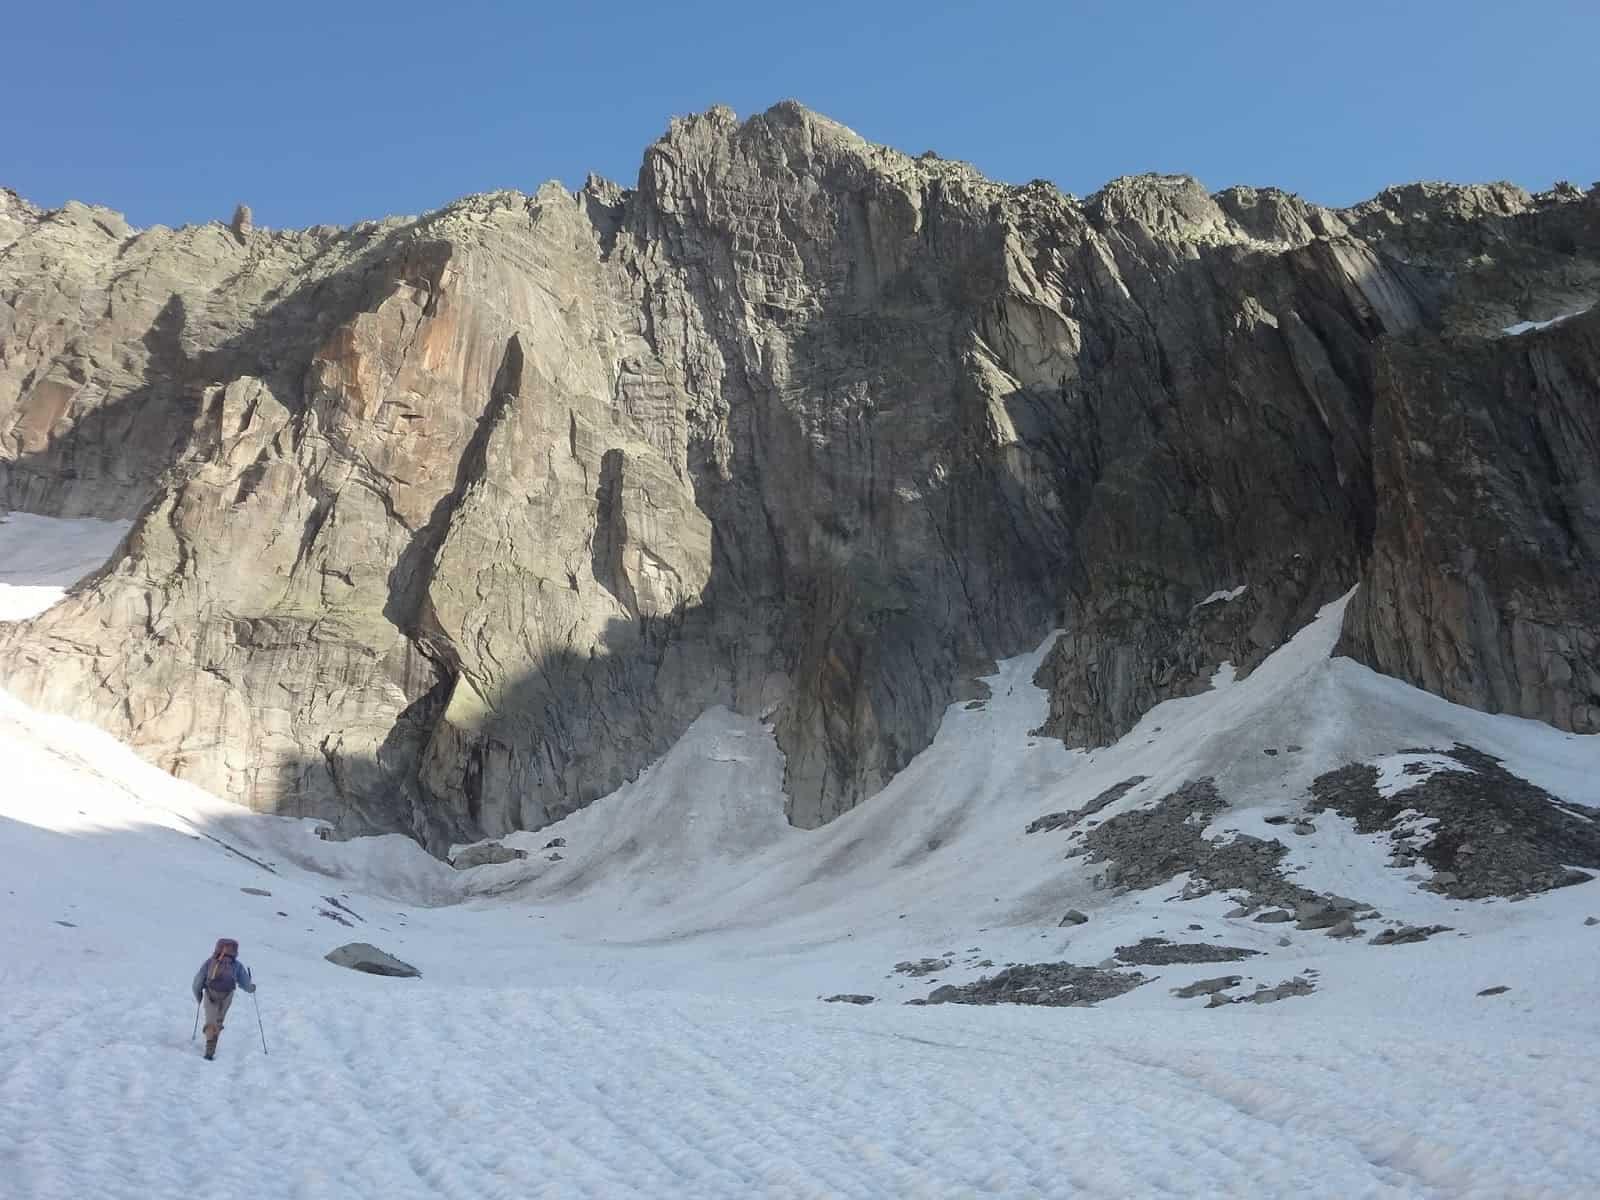 Klettern an der Grauen Wand